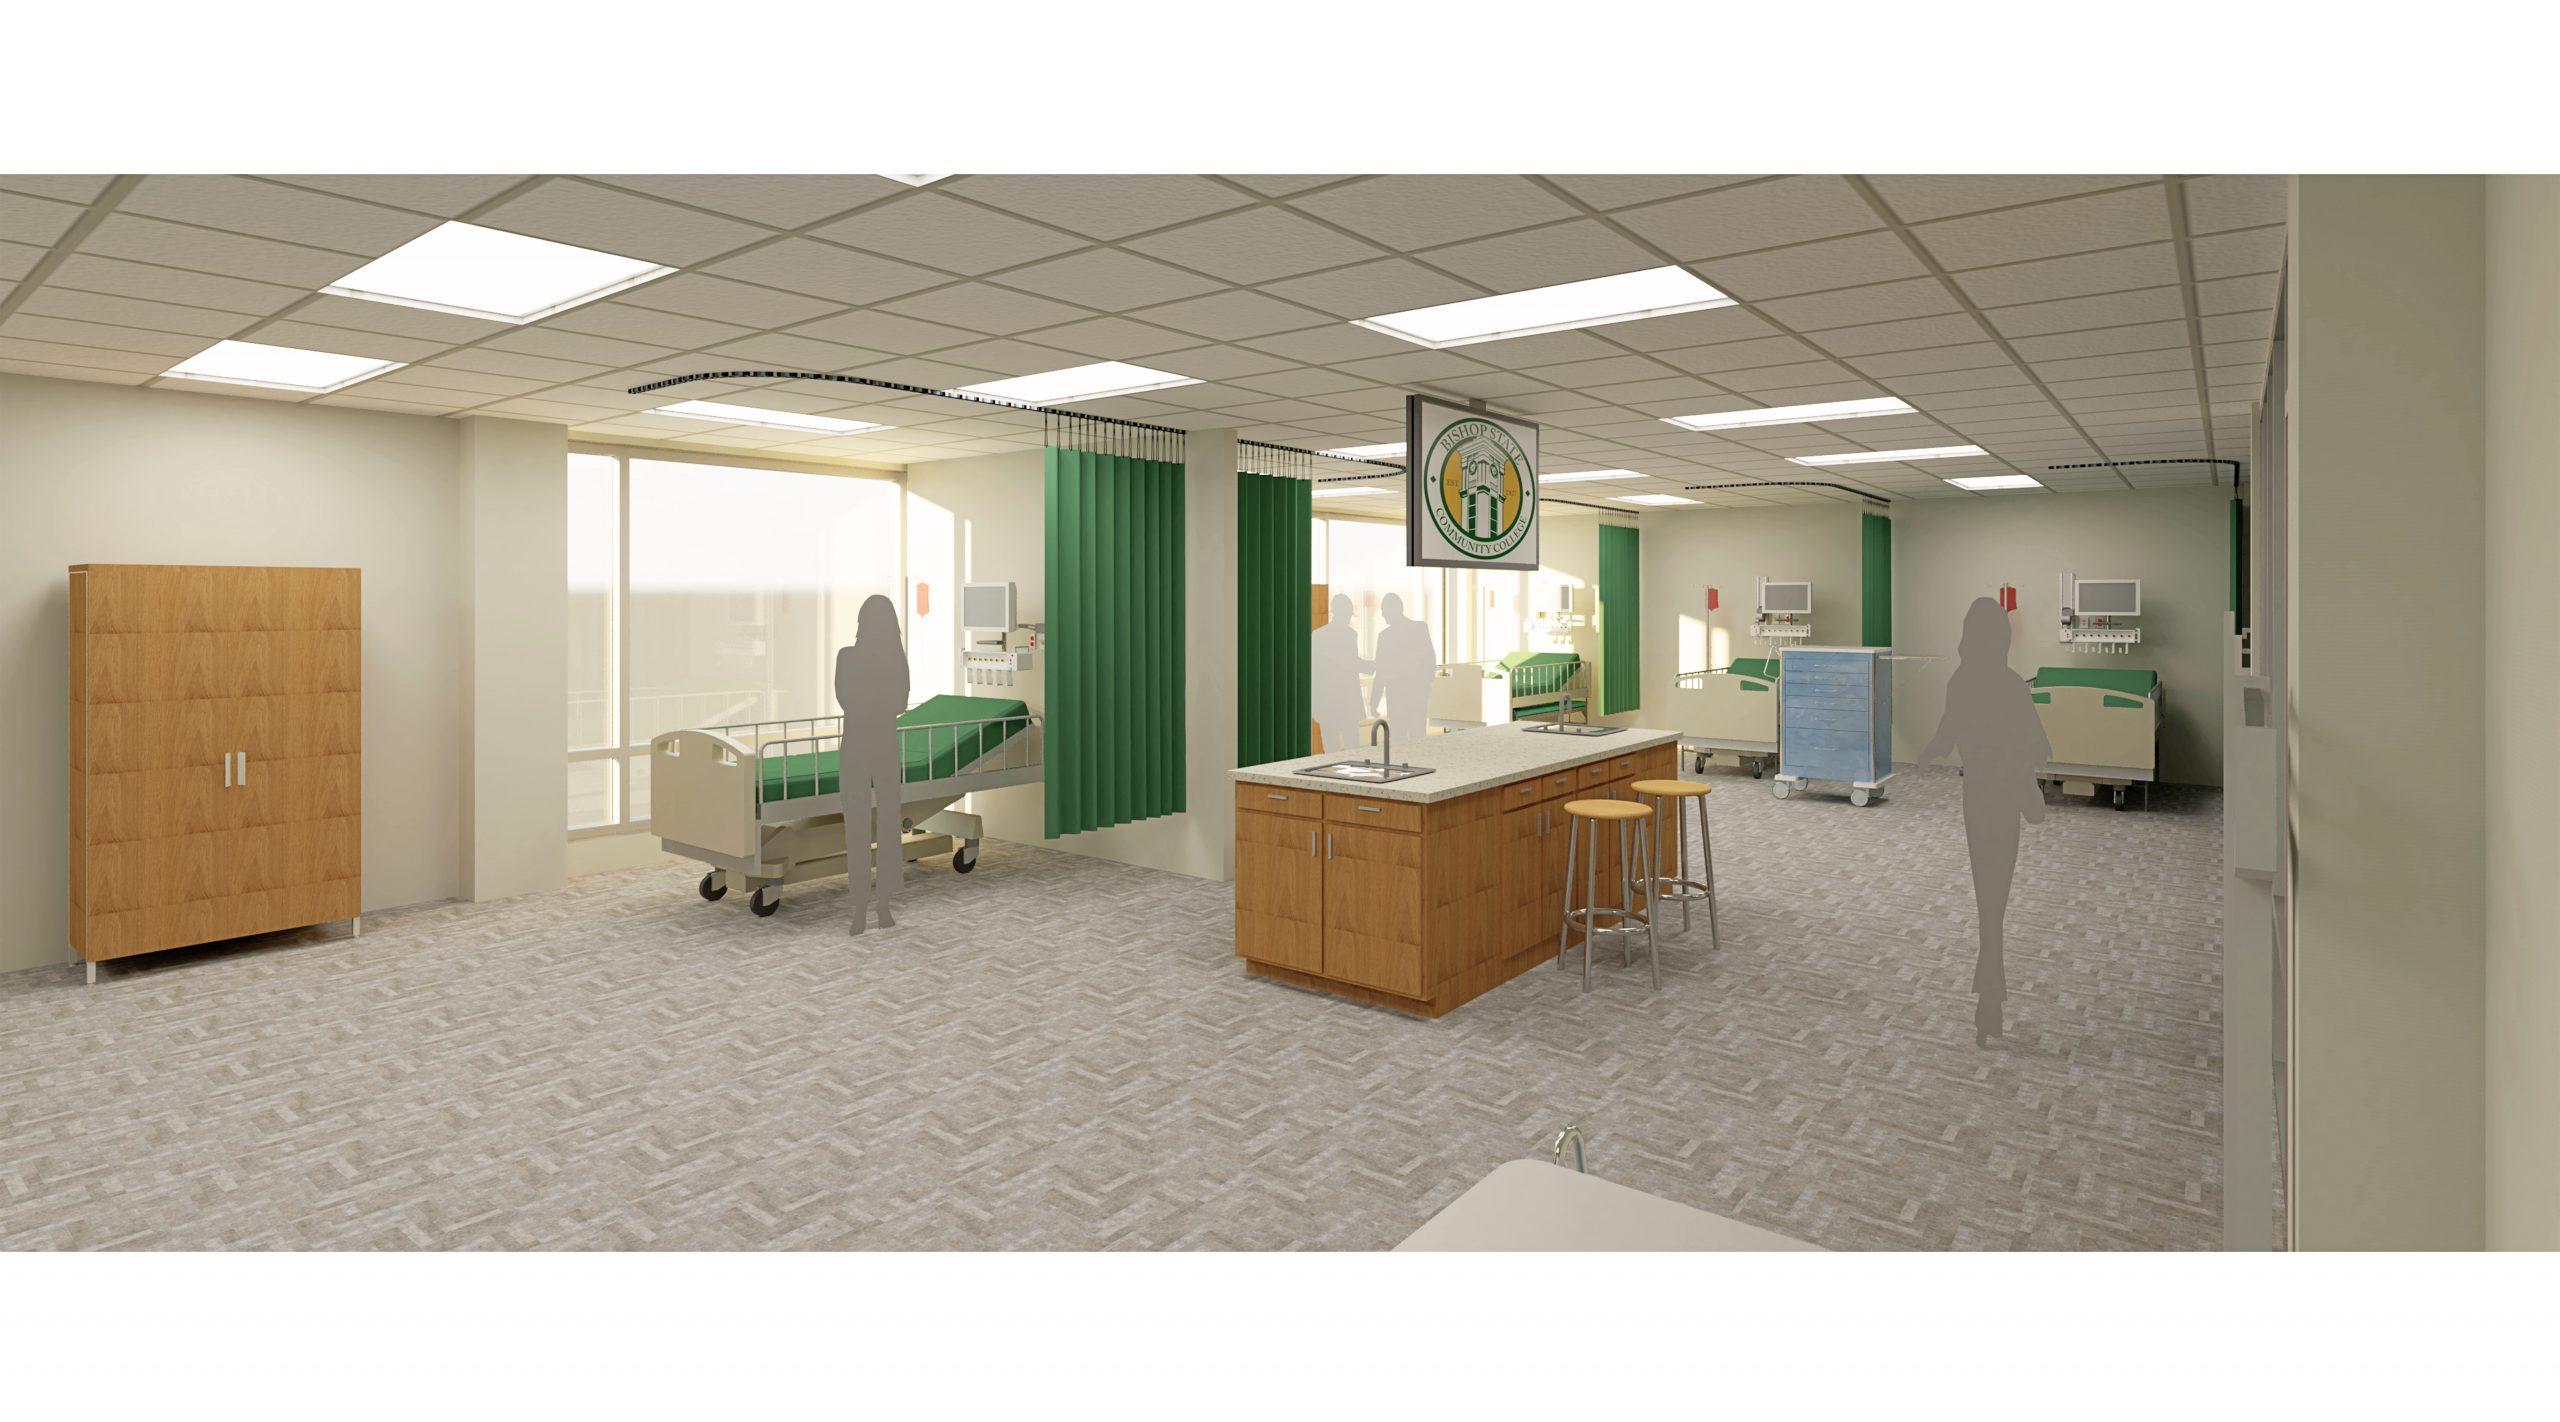 Health Sciences Building Nursing Lab - Bishop State Community College - Bishop State Foundation - Mobile AL